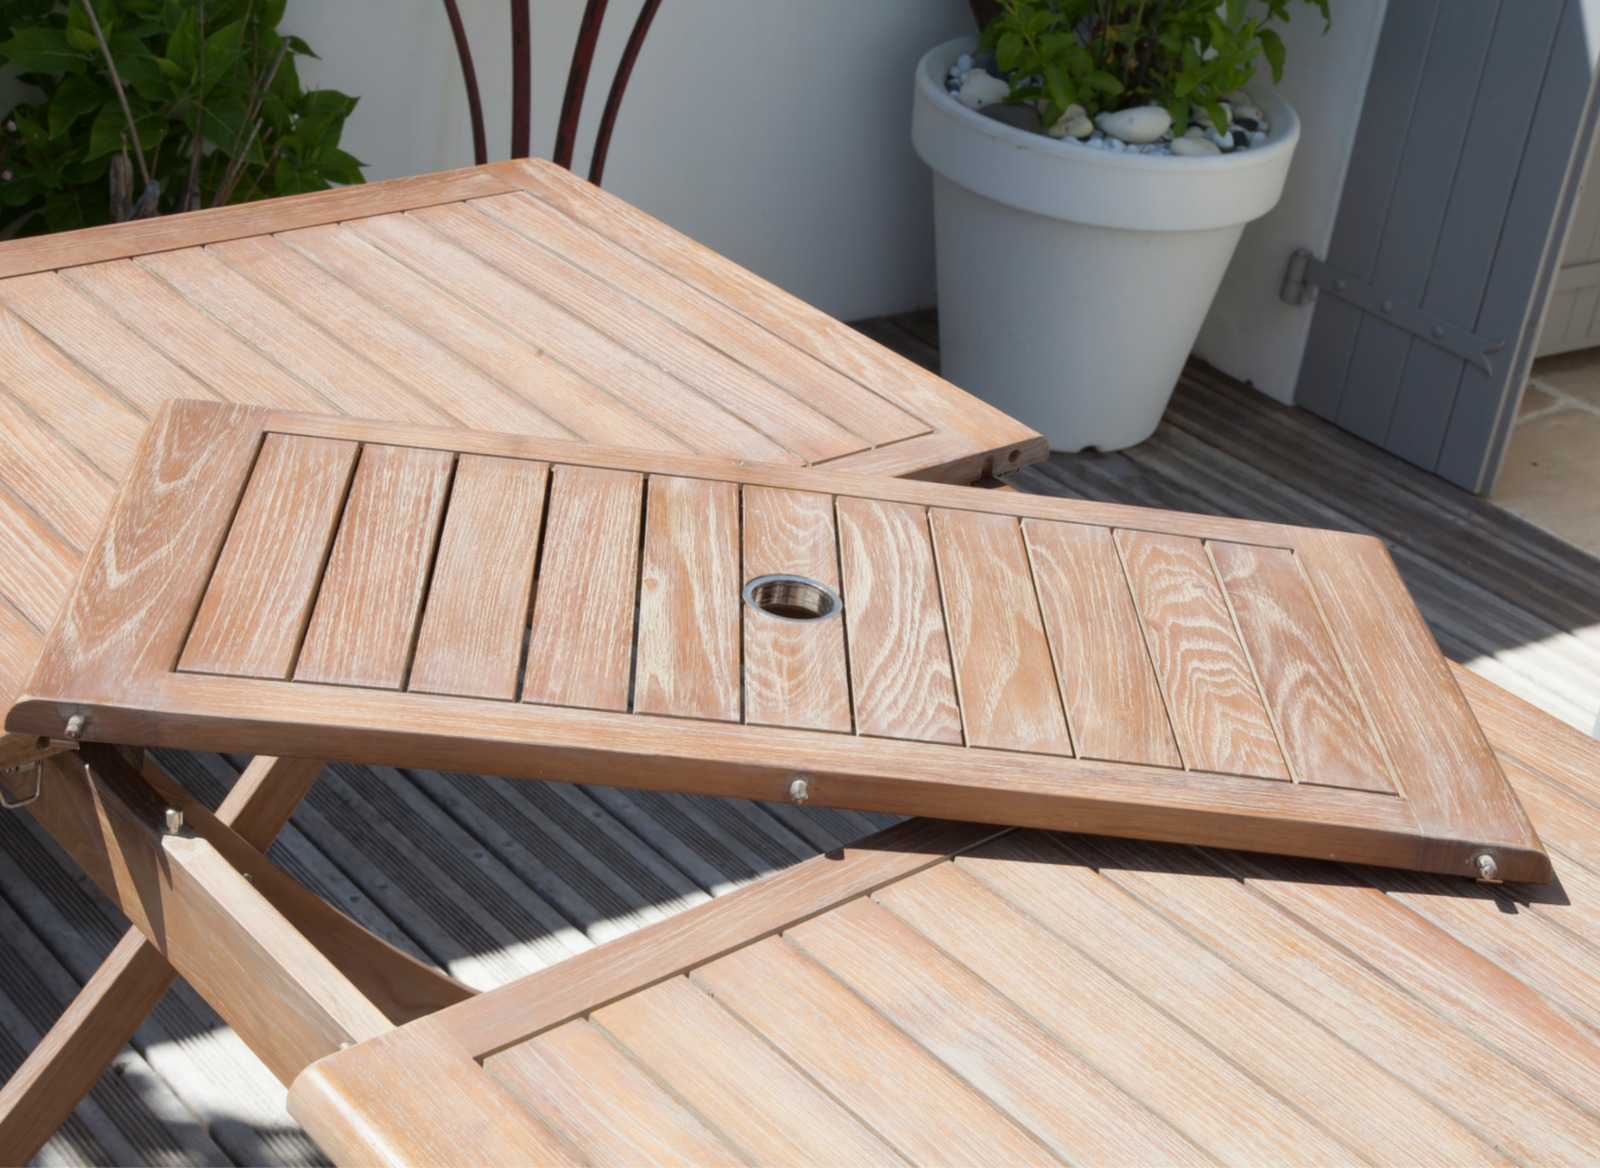 Table de jardin bois Theria 115/150 cm - Meubles jardin - Proloisirs